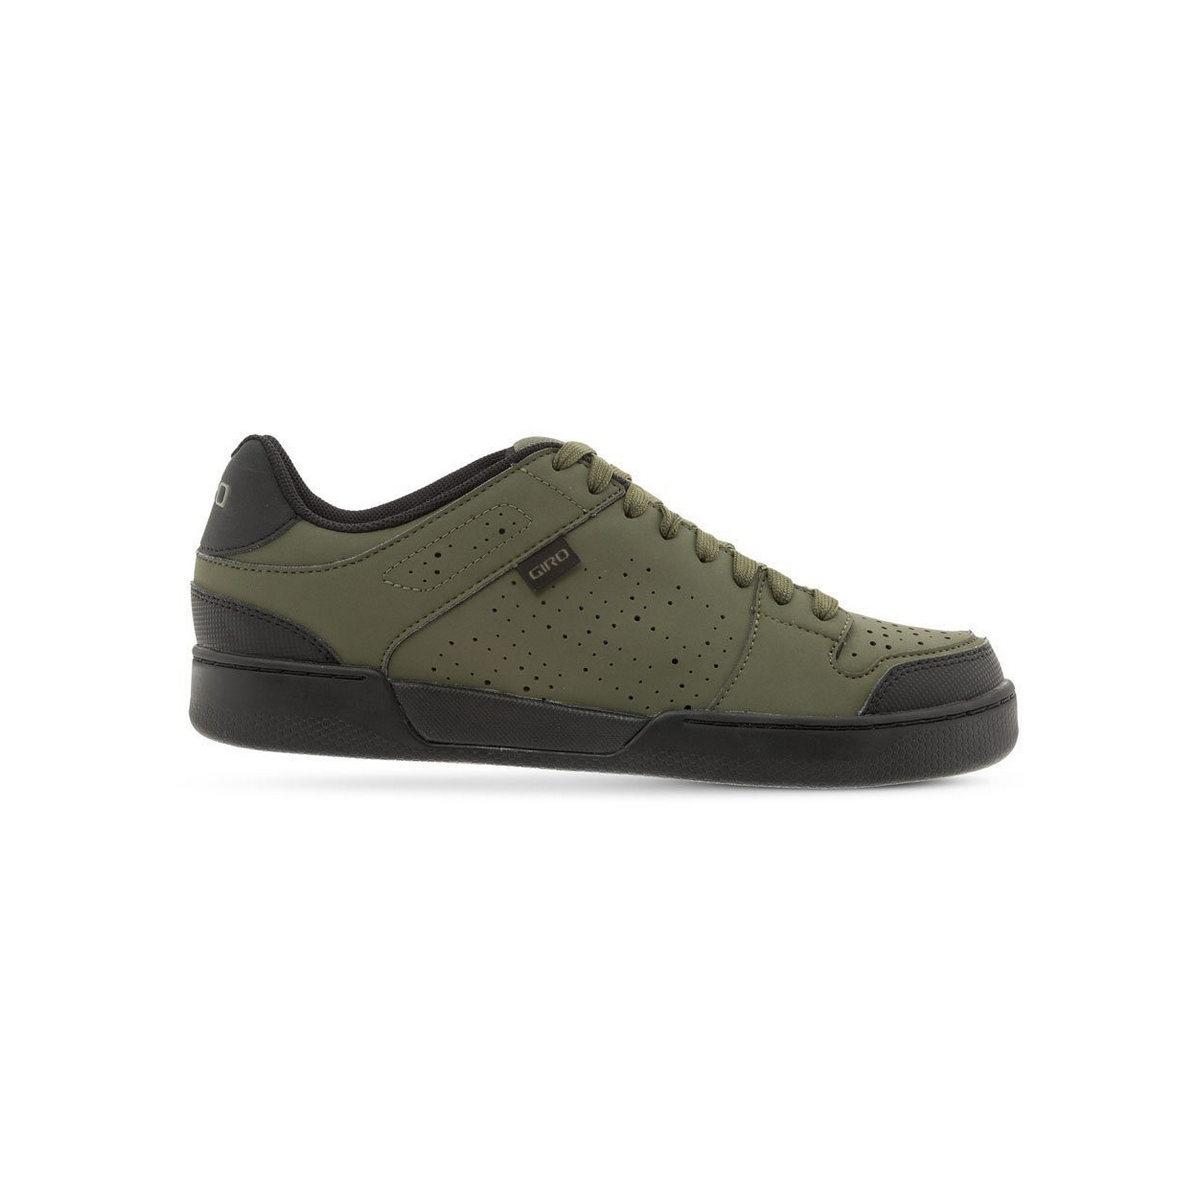 MTB Flat Shoes Jacket II Green Size 41